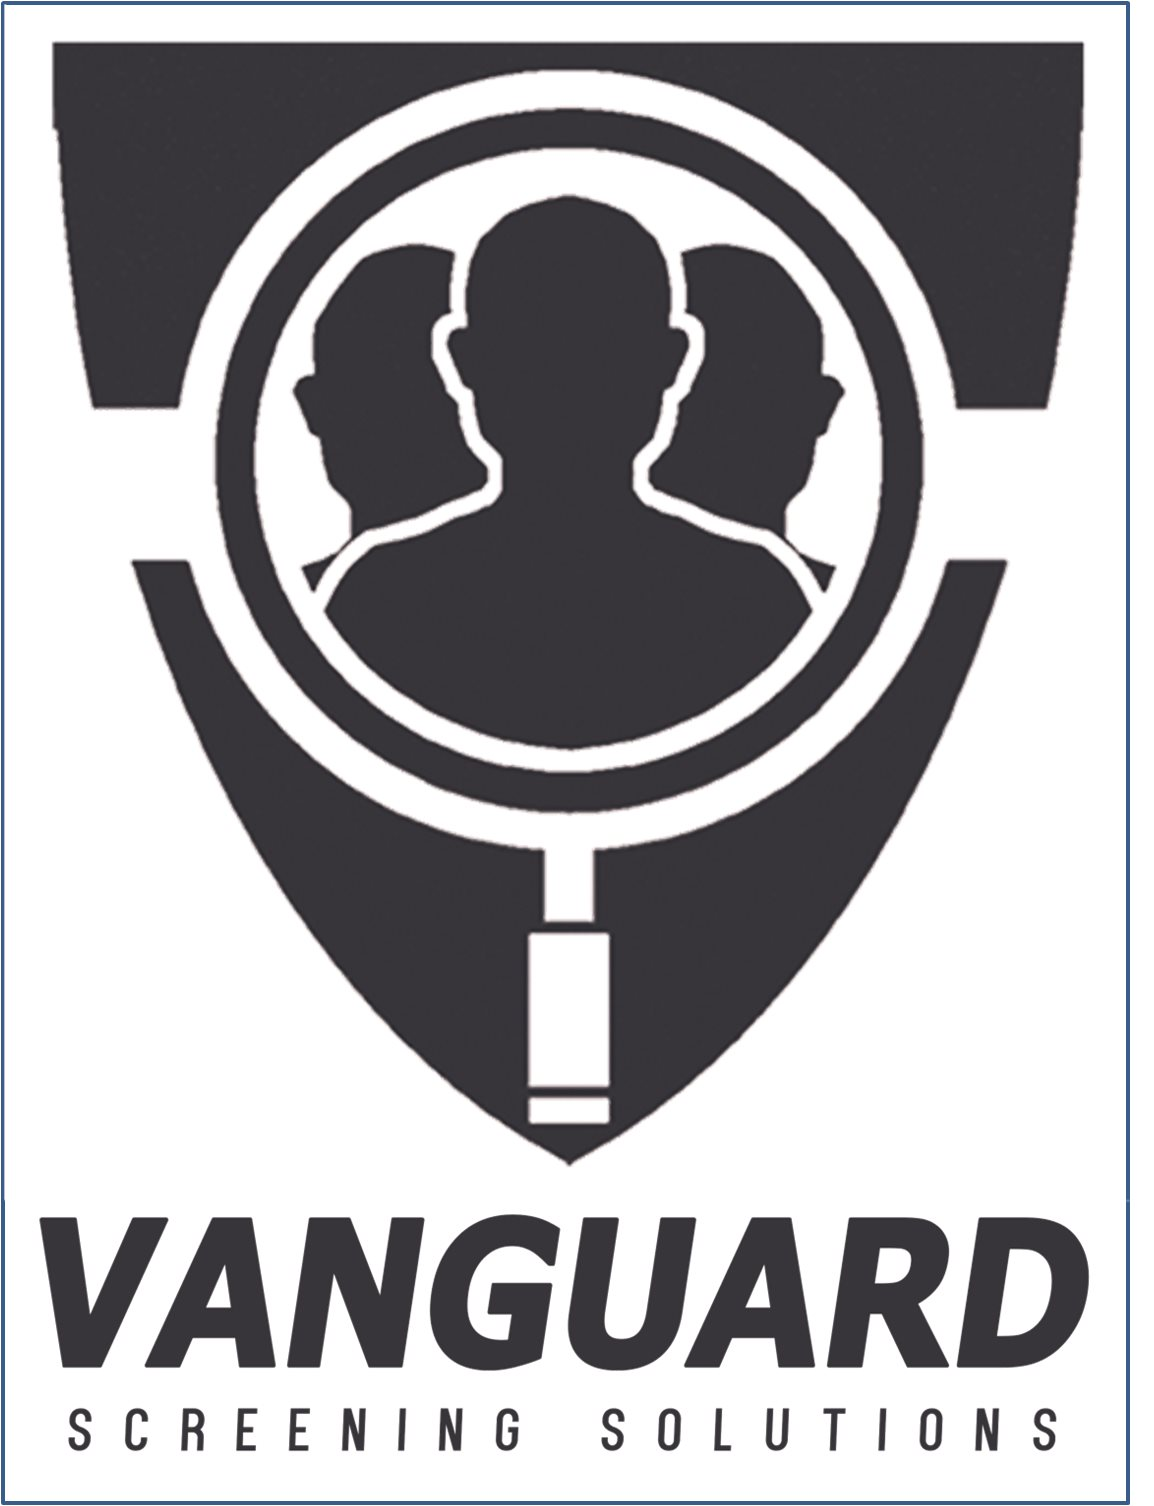 Vanguard Screening Solutions, Inc.